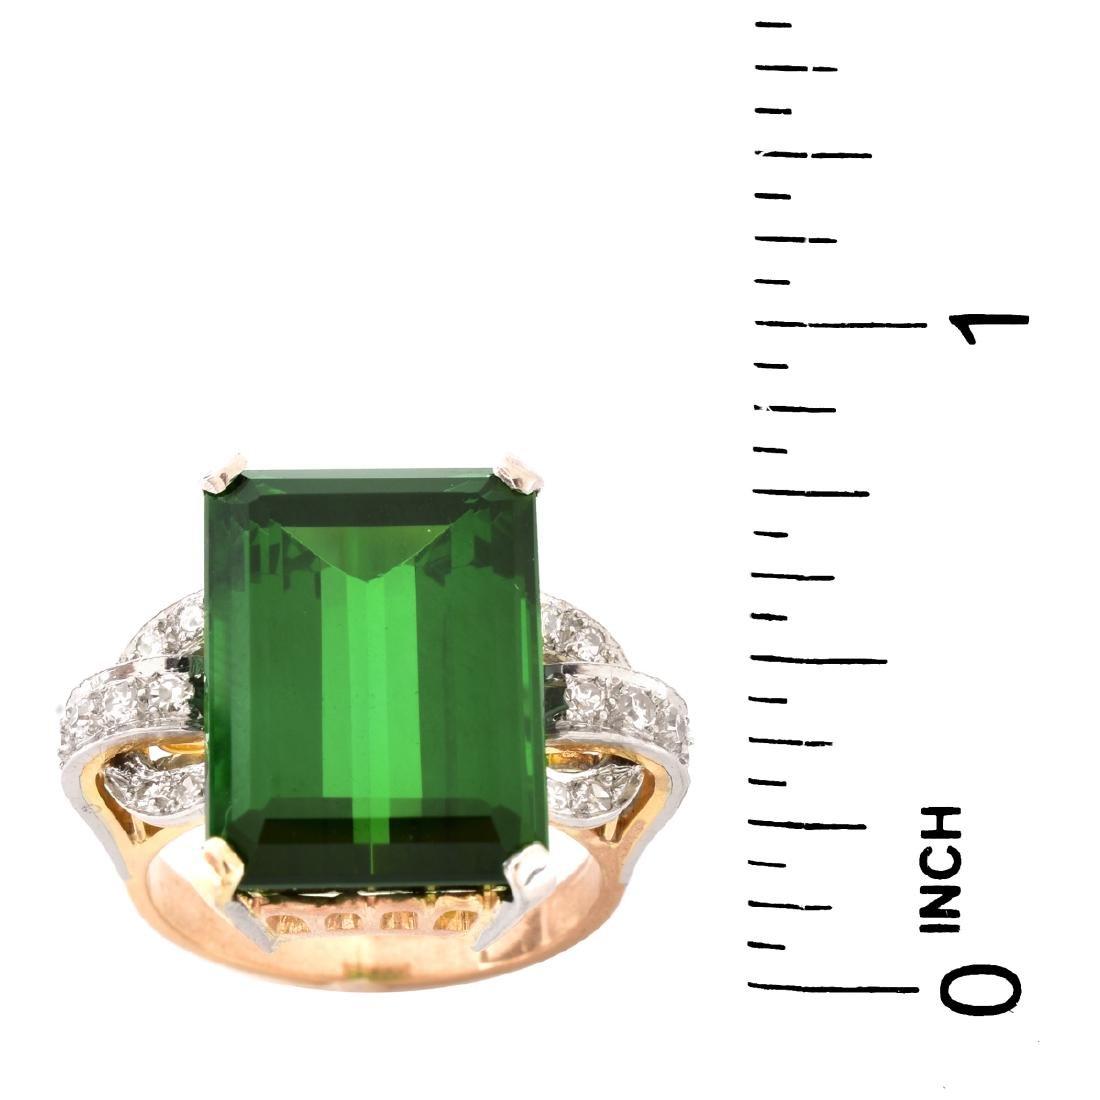 French Tourmaline, Diamond and 18K Gold Ring - 5